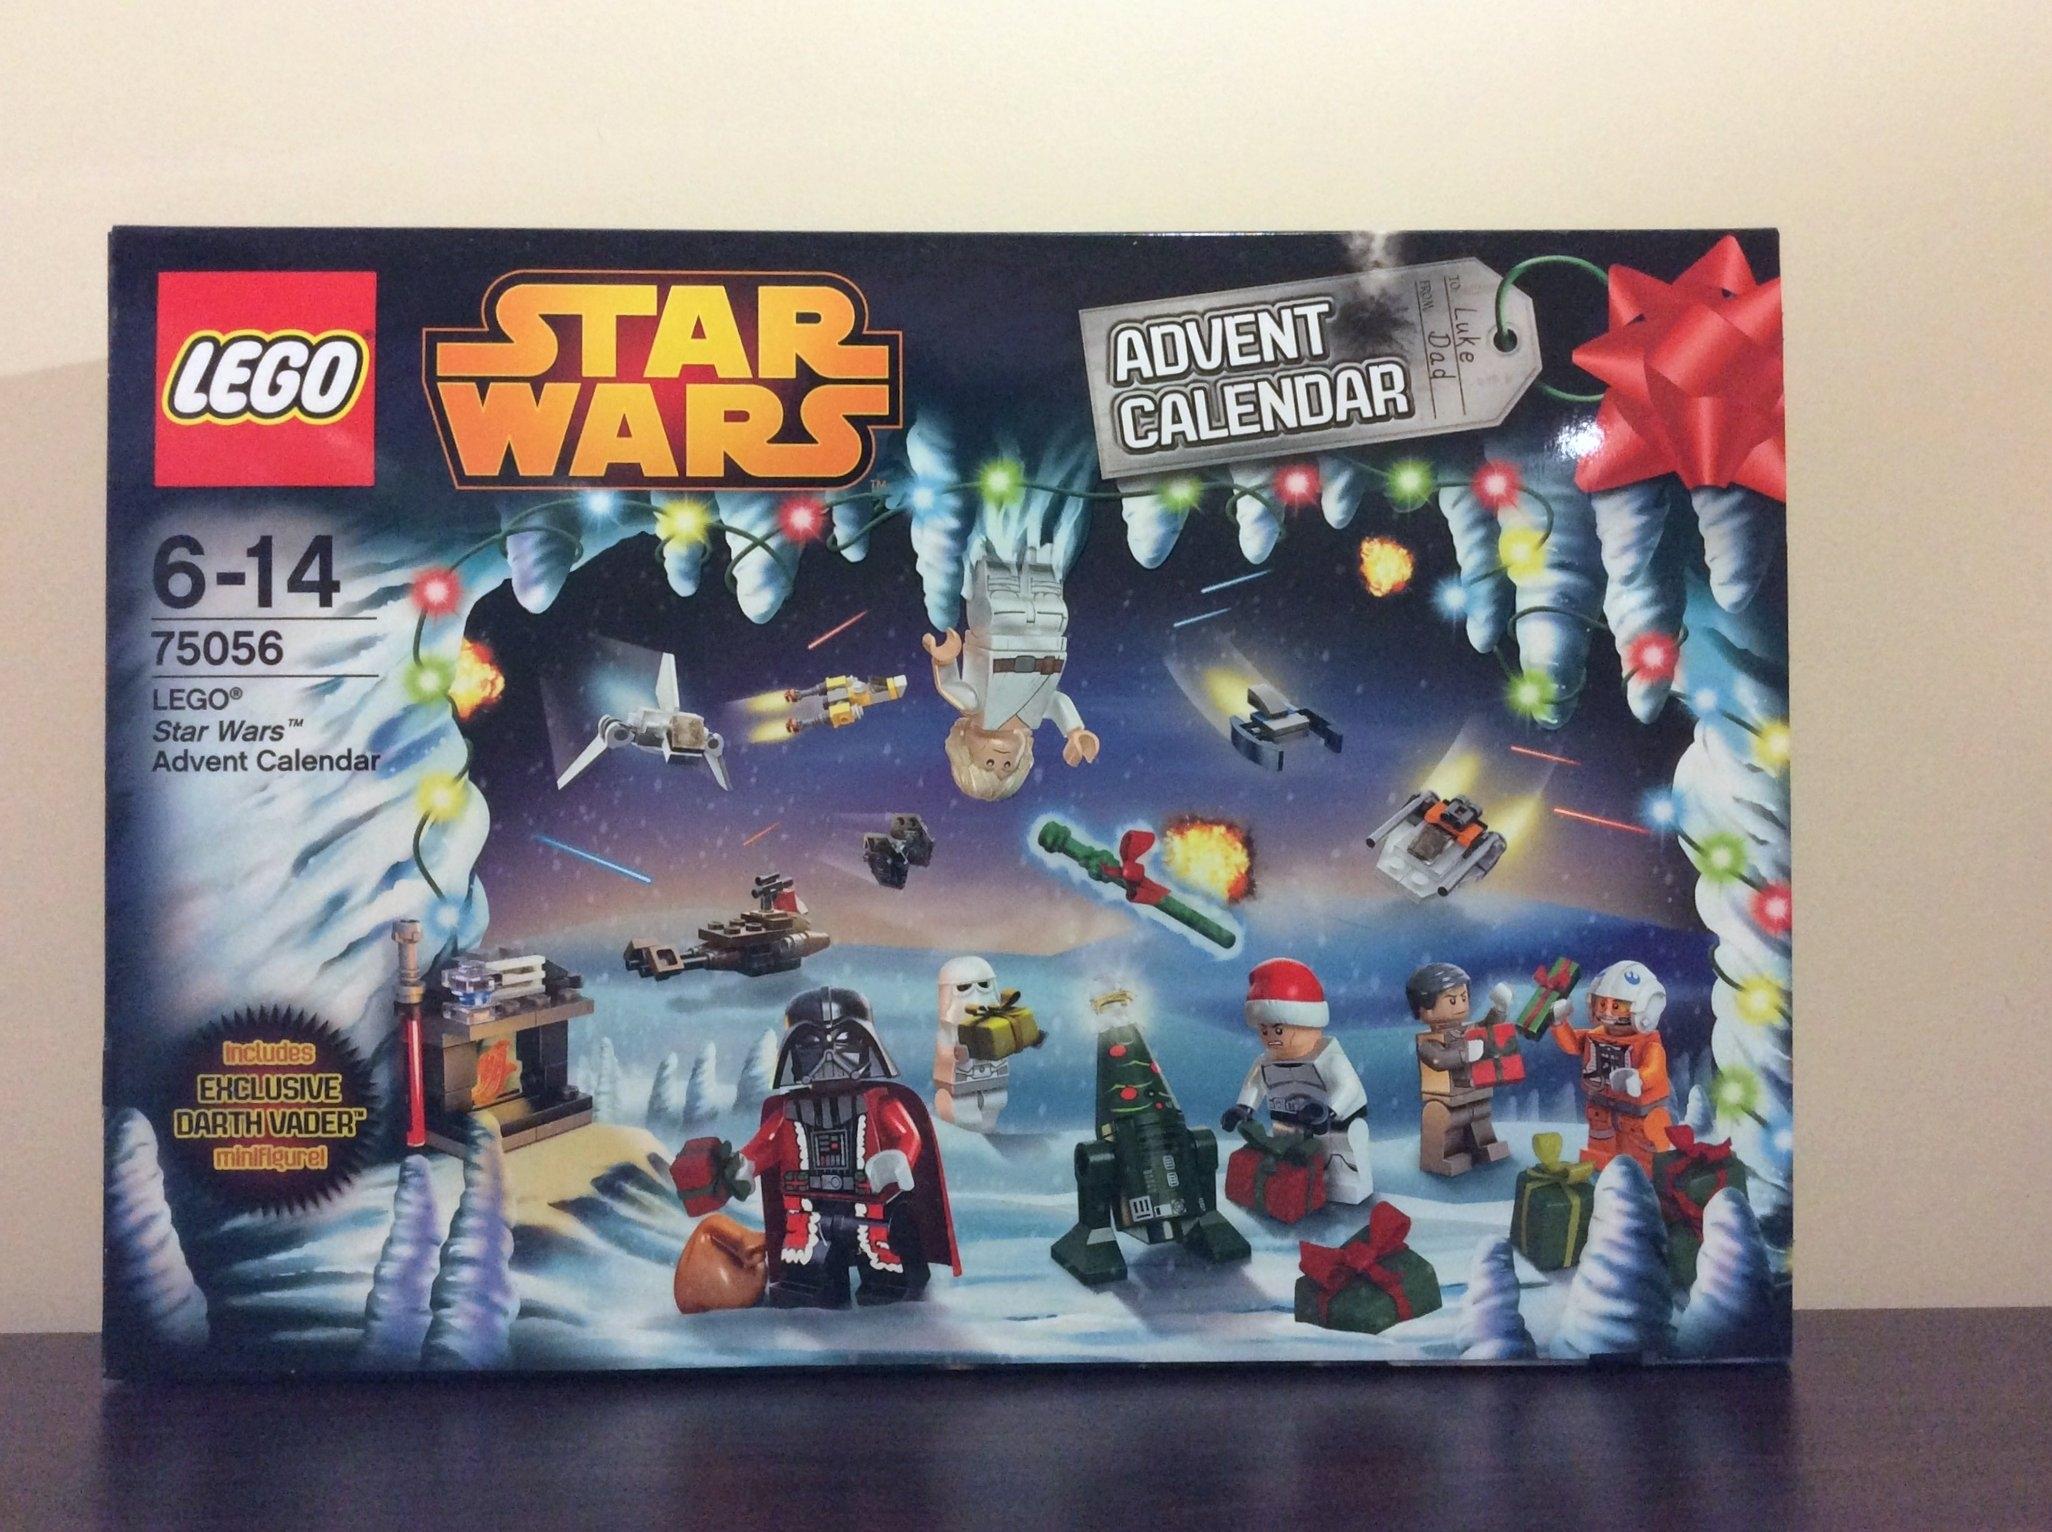 Lego Star Wars Advent Calendar 2014 - Jay'S Brick Blog